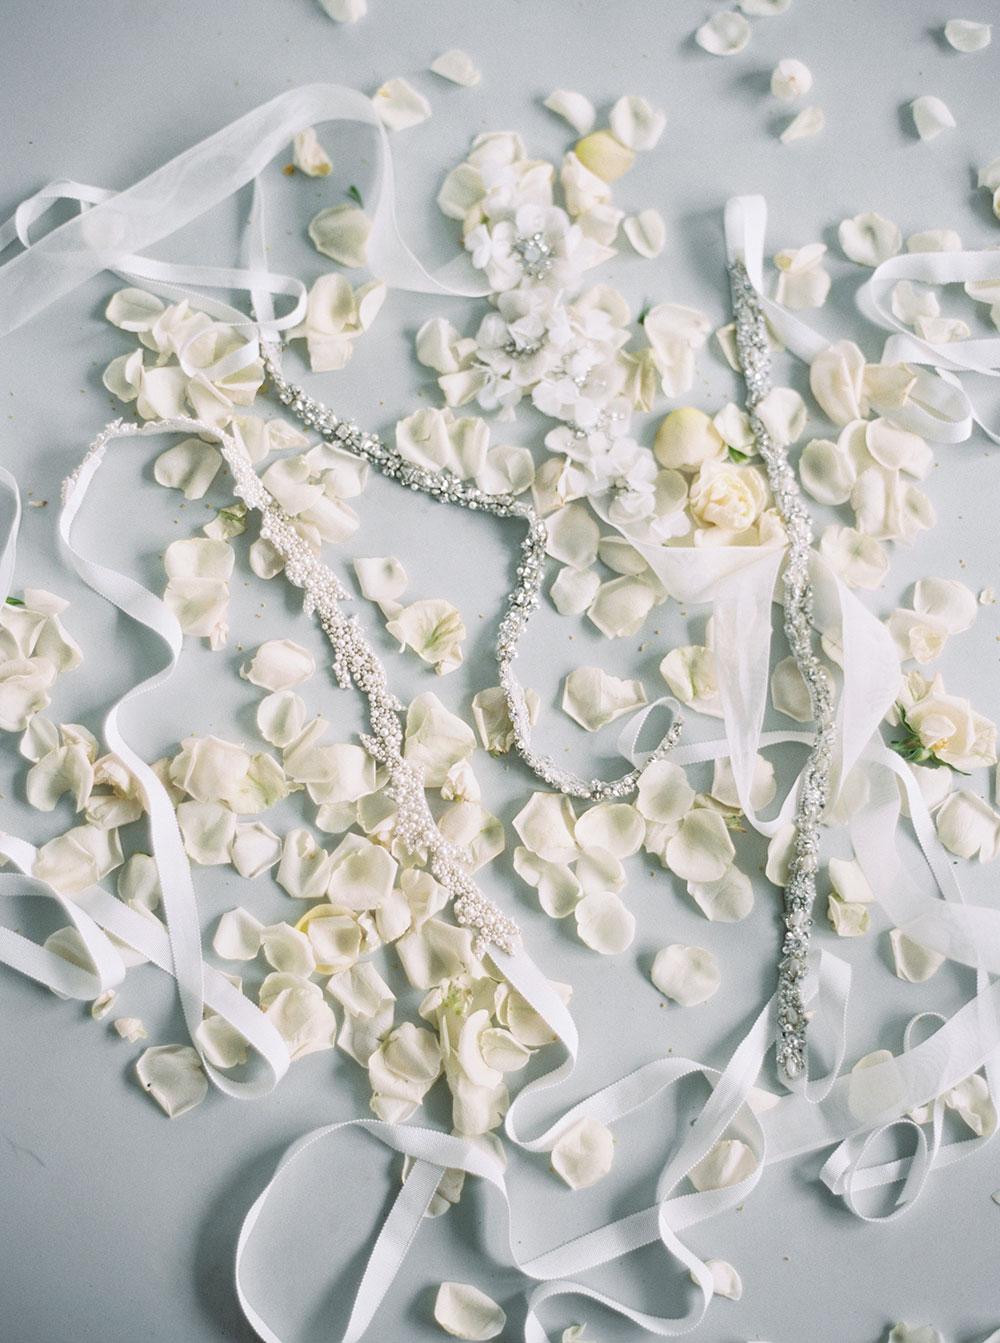 mStarr-your-dream-bridal-193.jpg